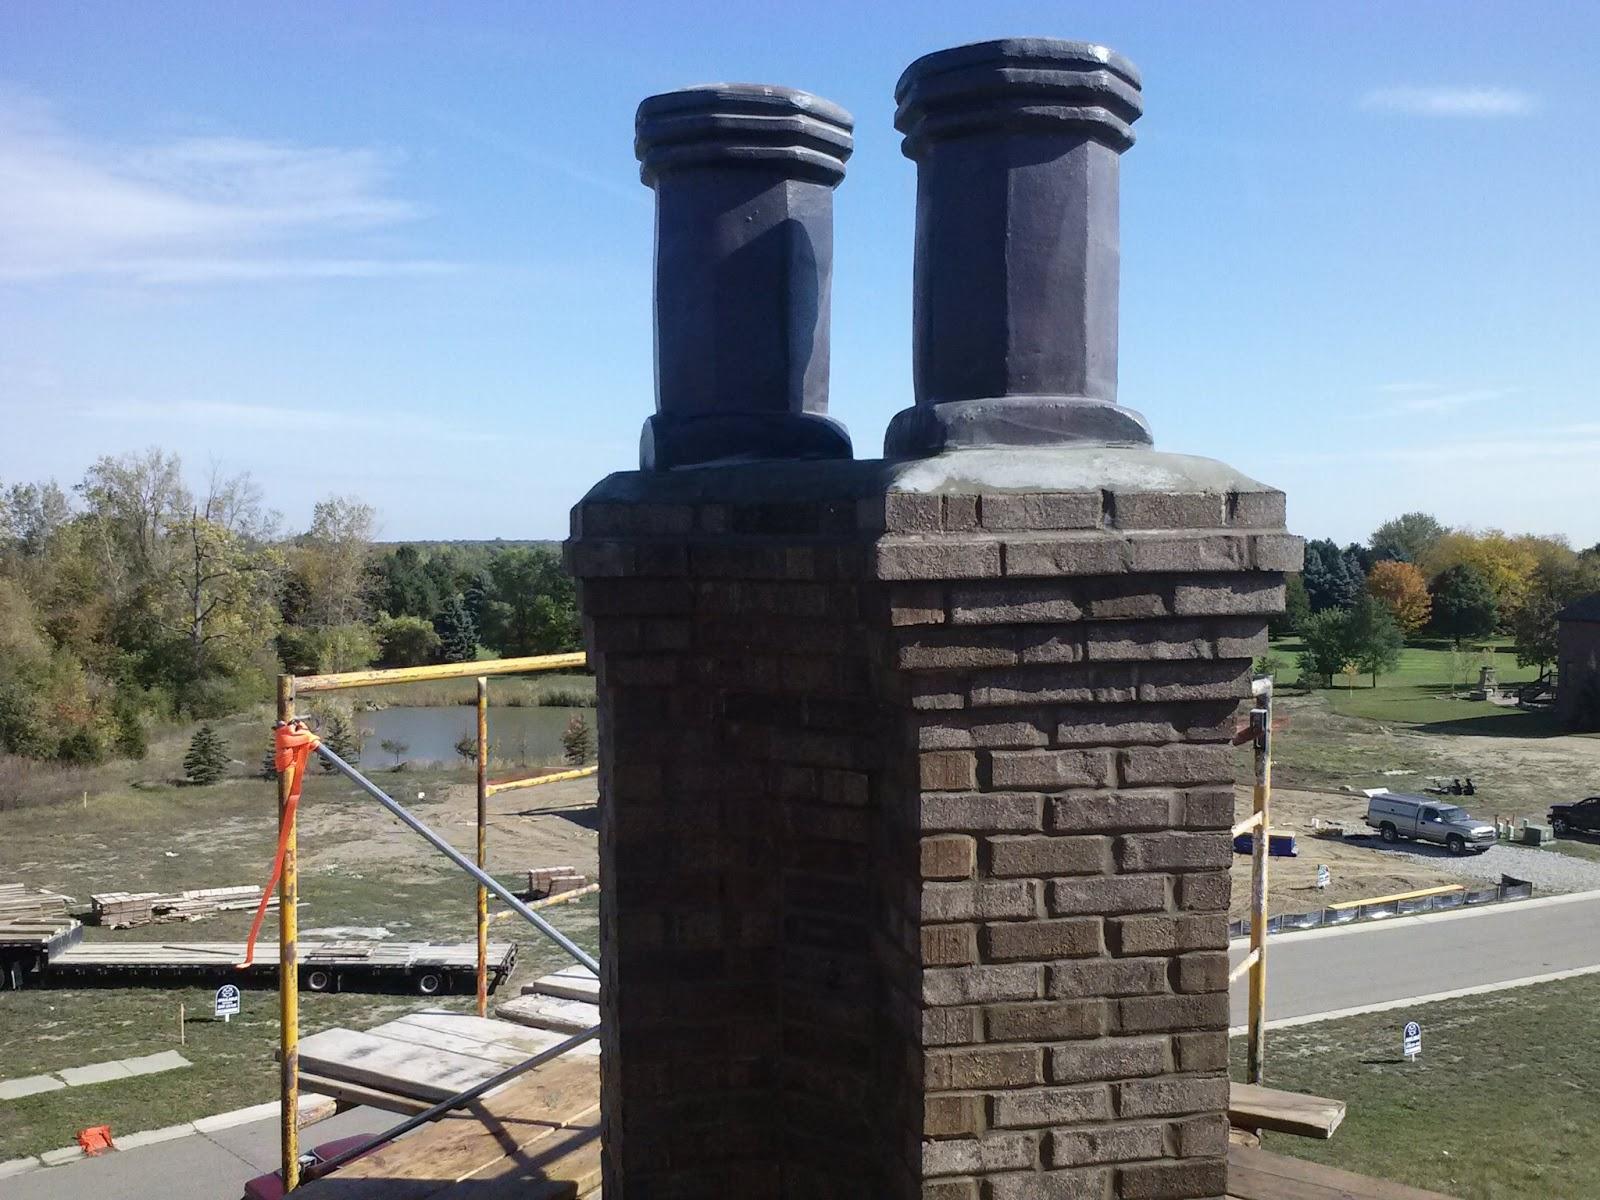 Sensational West Bloomfield Chimney Repair 248 202 5740 Download Free Architecture Designs Grimeyleaguecom